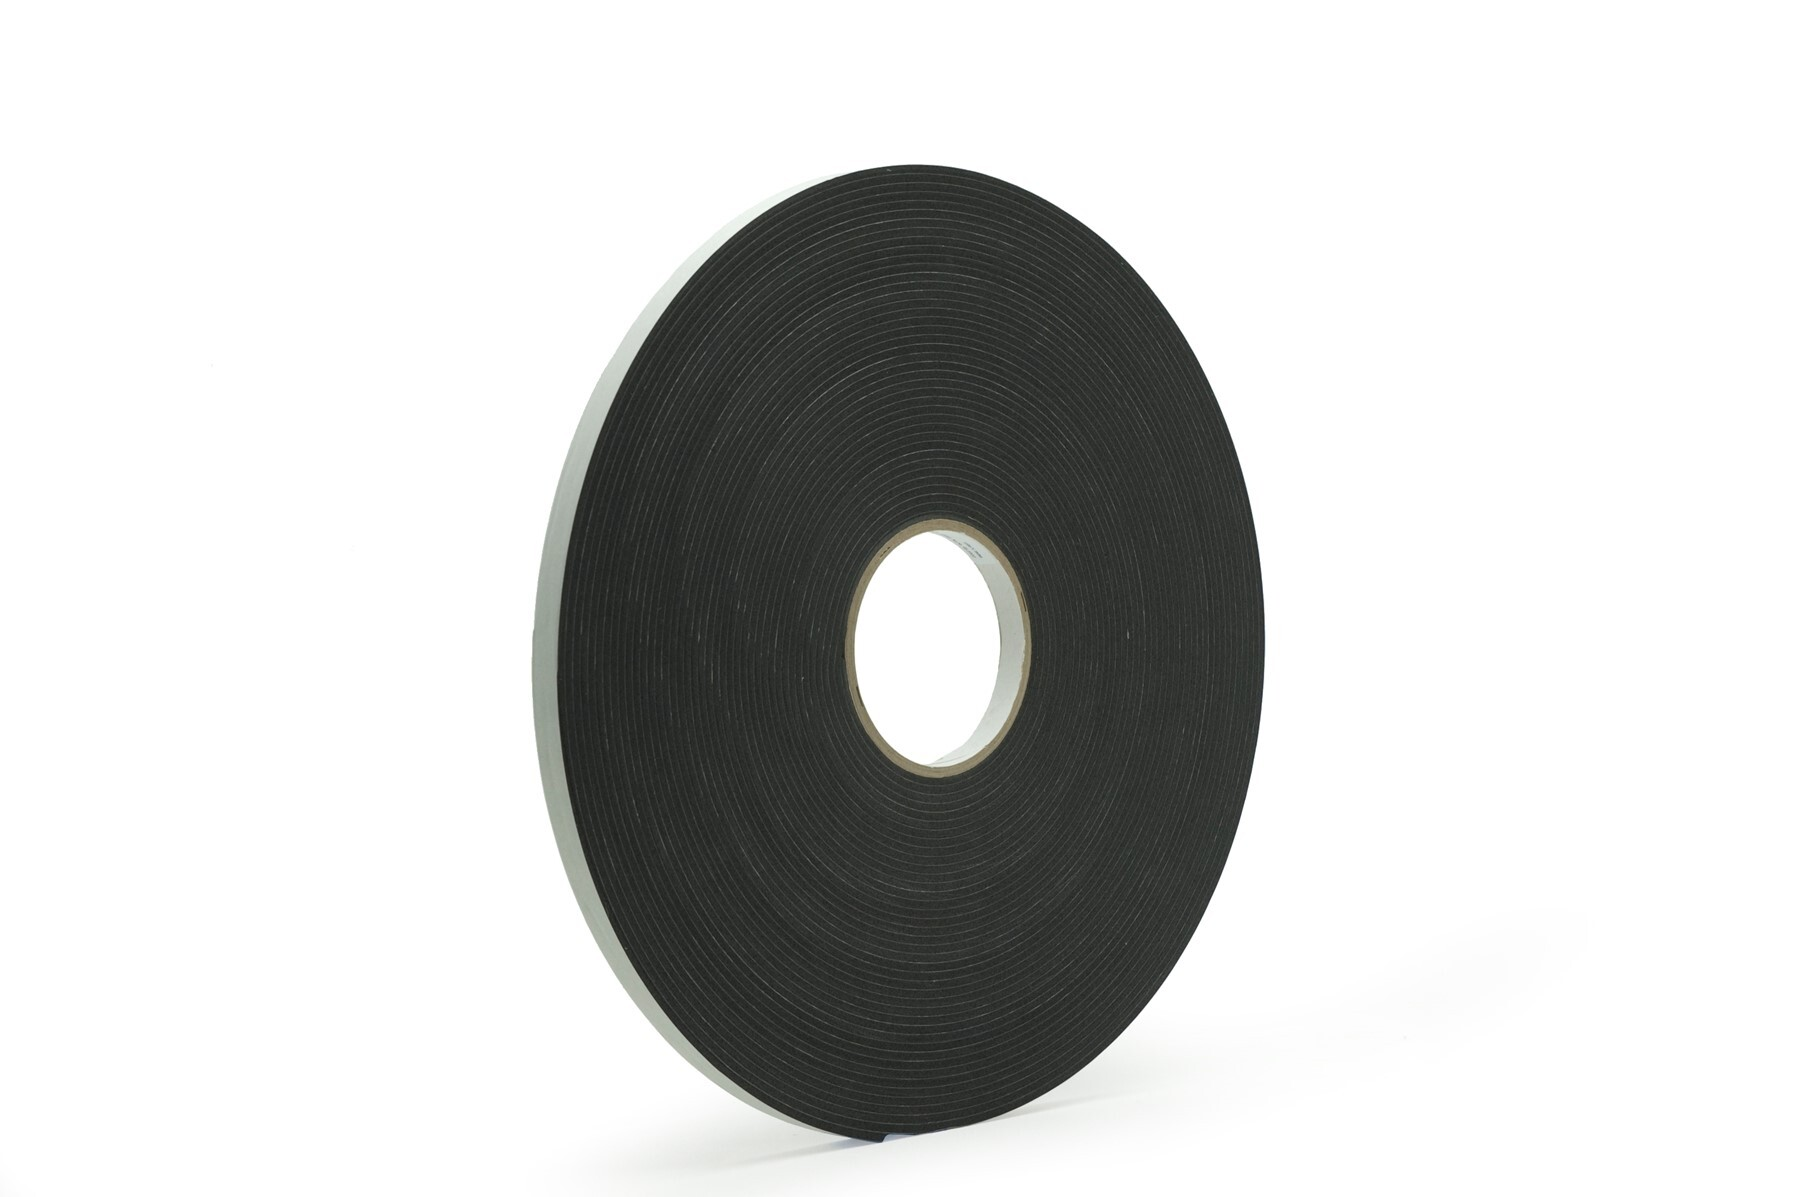 Fixatie Tape Project